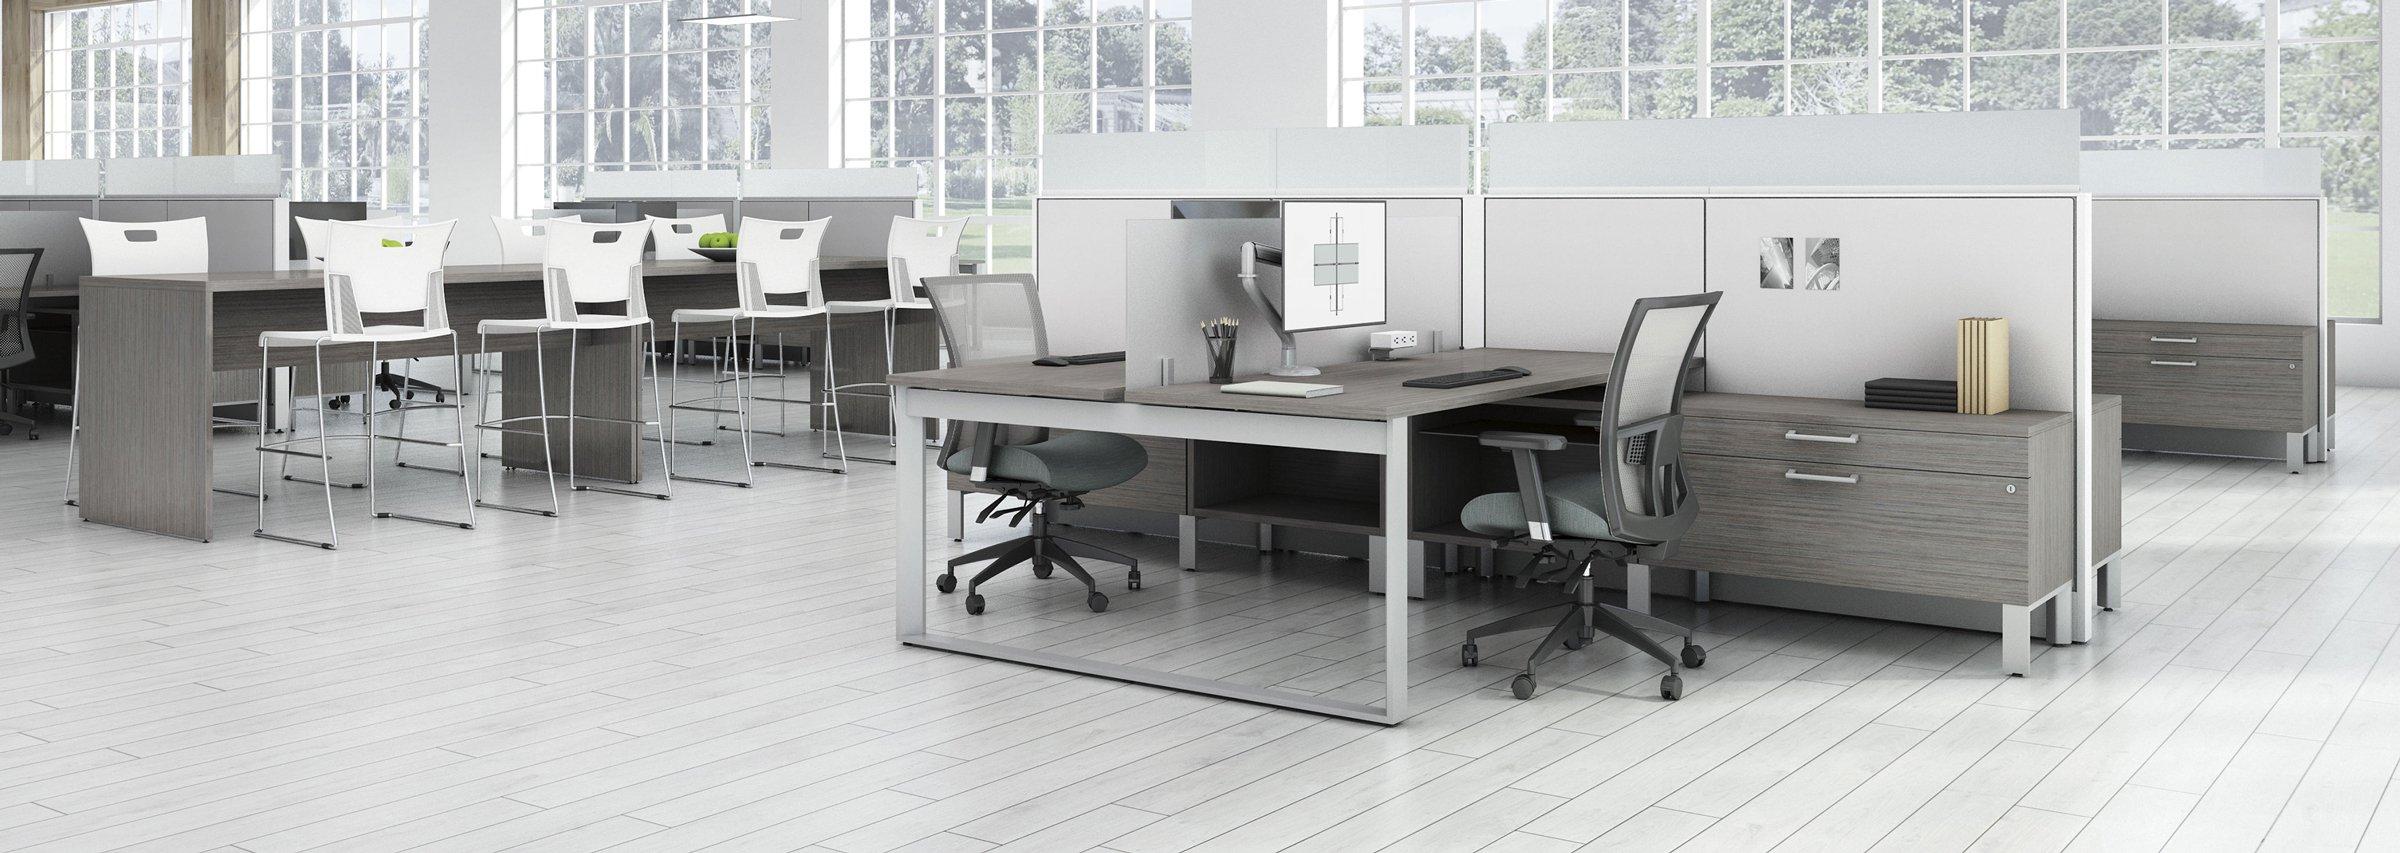 Richmond TX Office Furniture | Collaborative Office Interiors